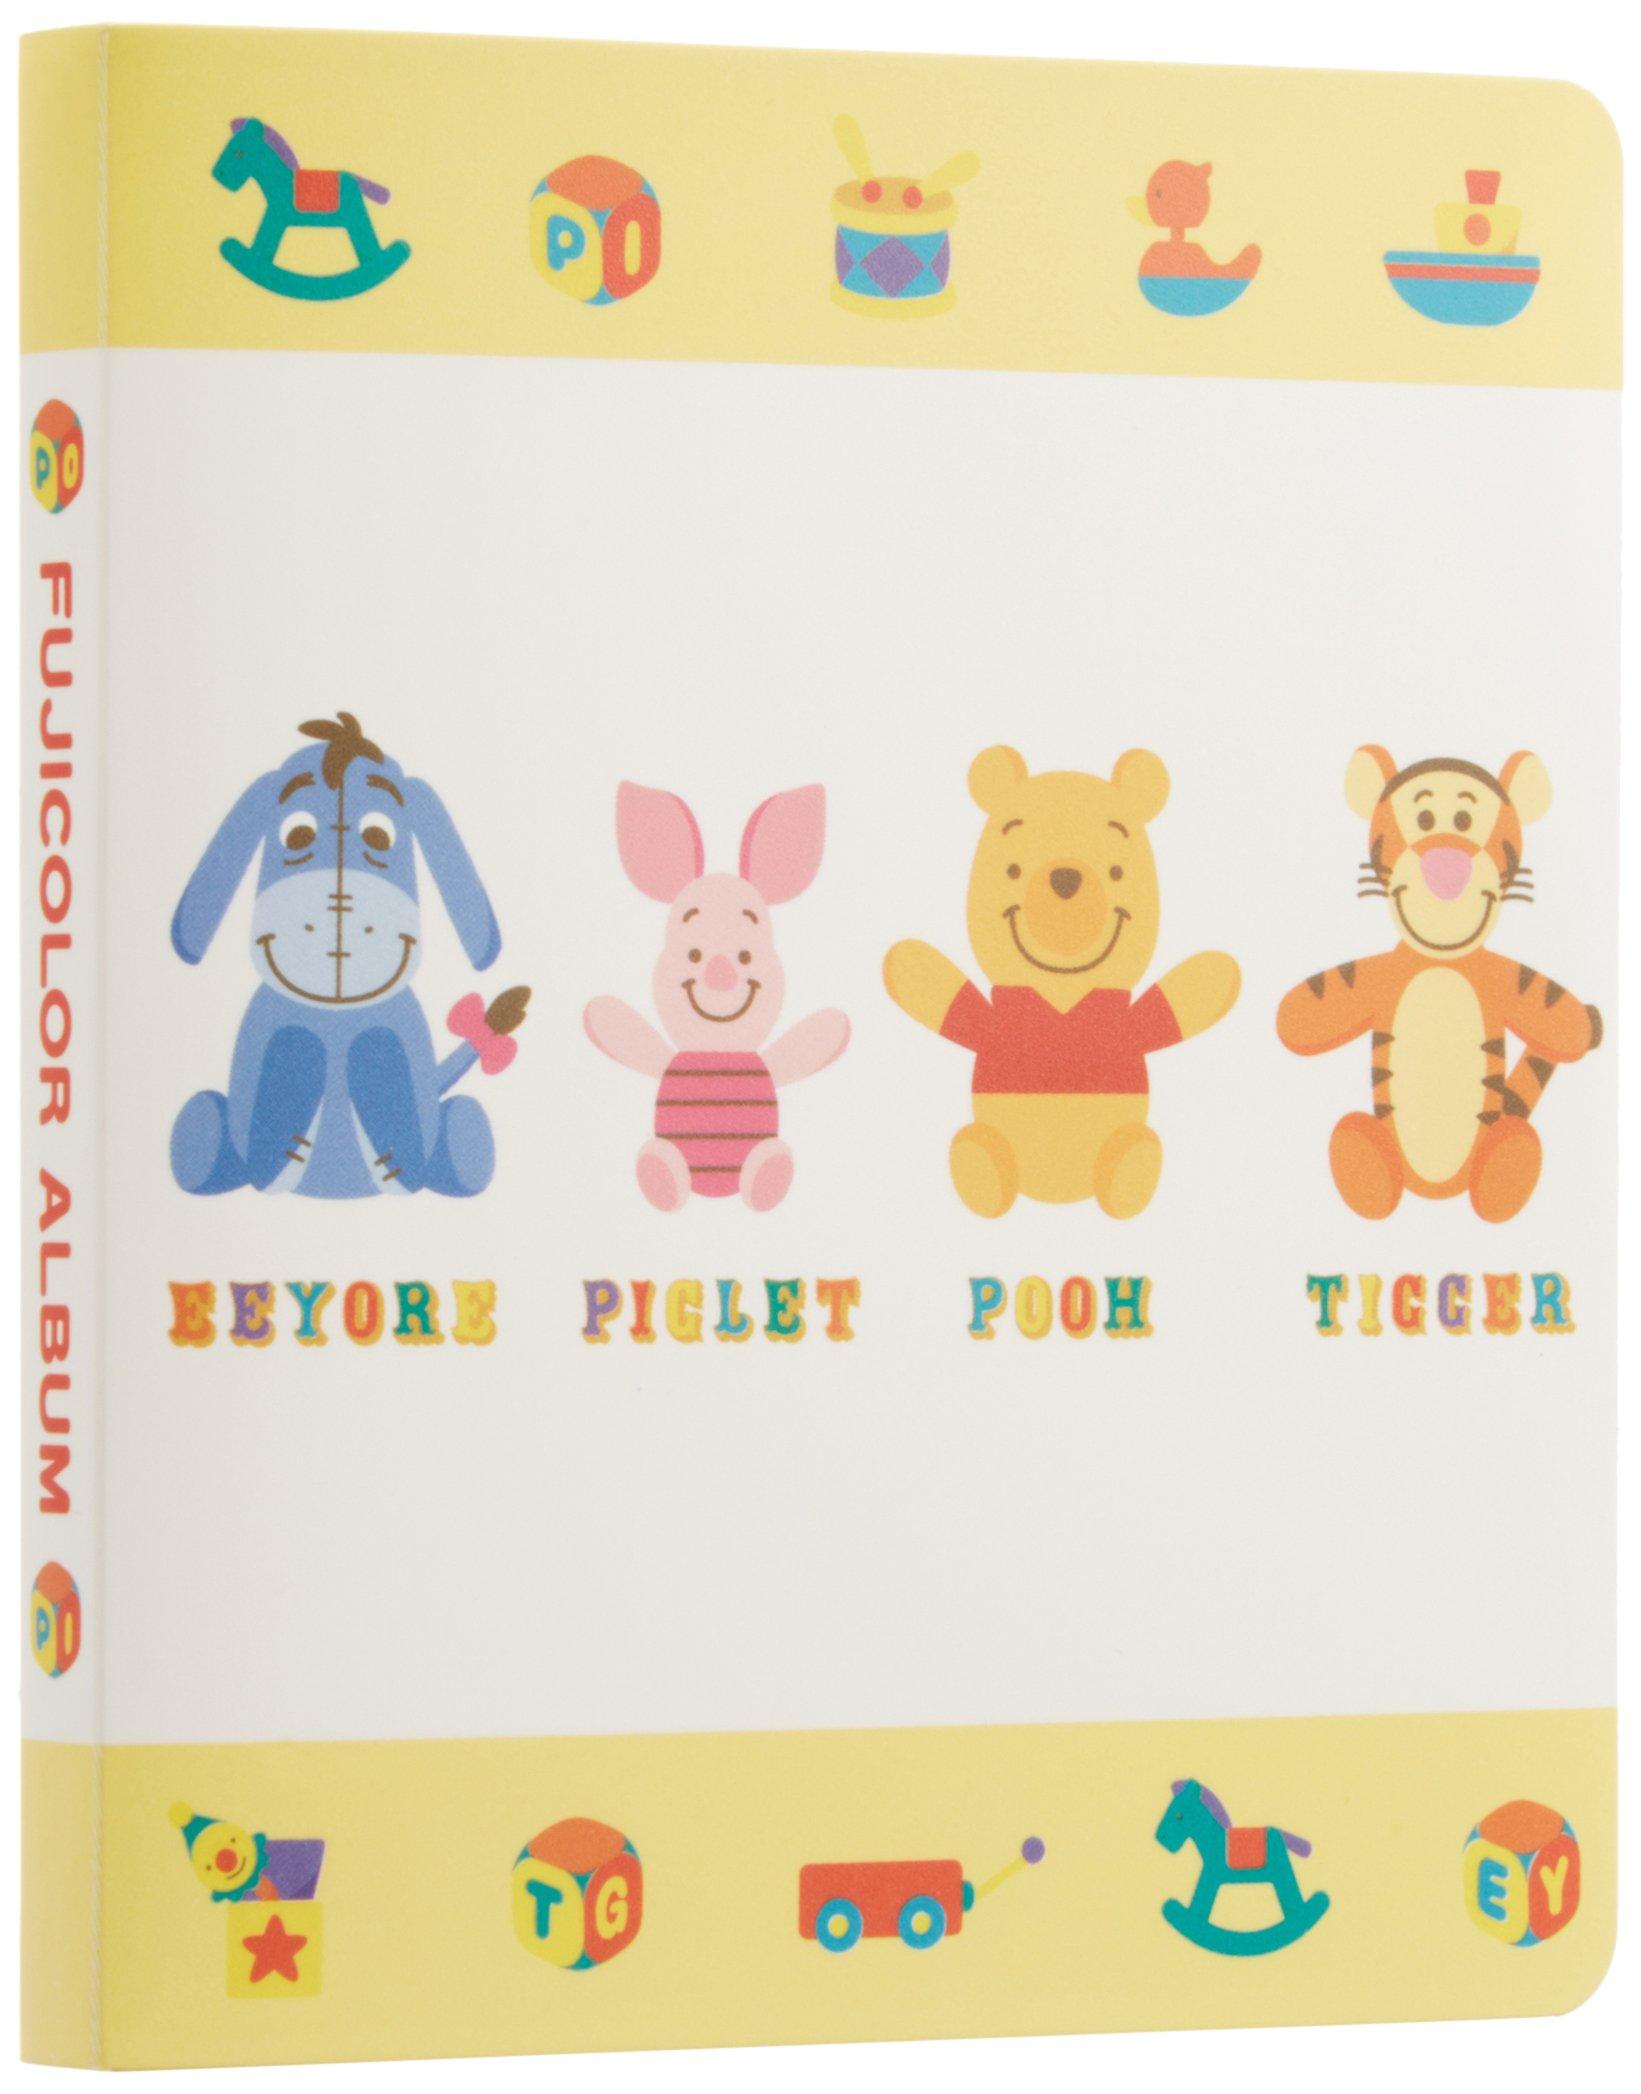 Fuji Disney Pooh Photo Album for Fuji Instax Mini 7s /50s/ Polaroid Mio /300 Lomo Diana Back Cameras